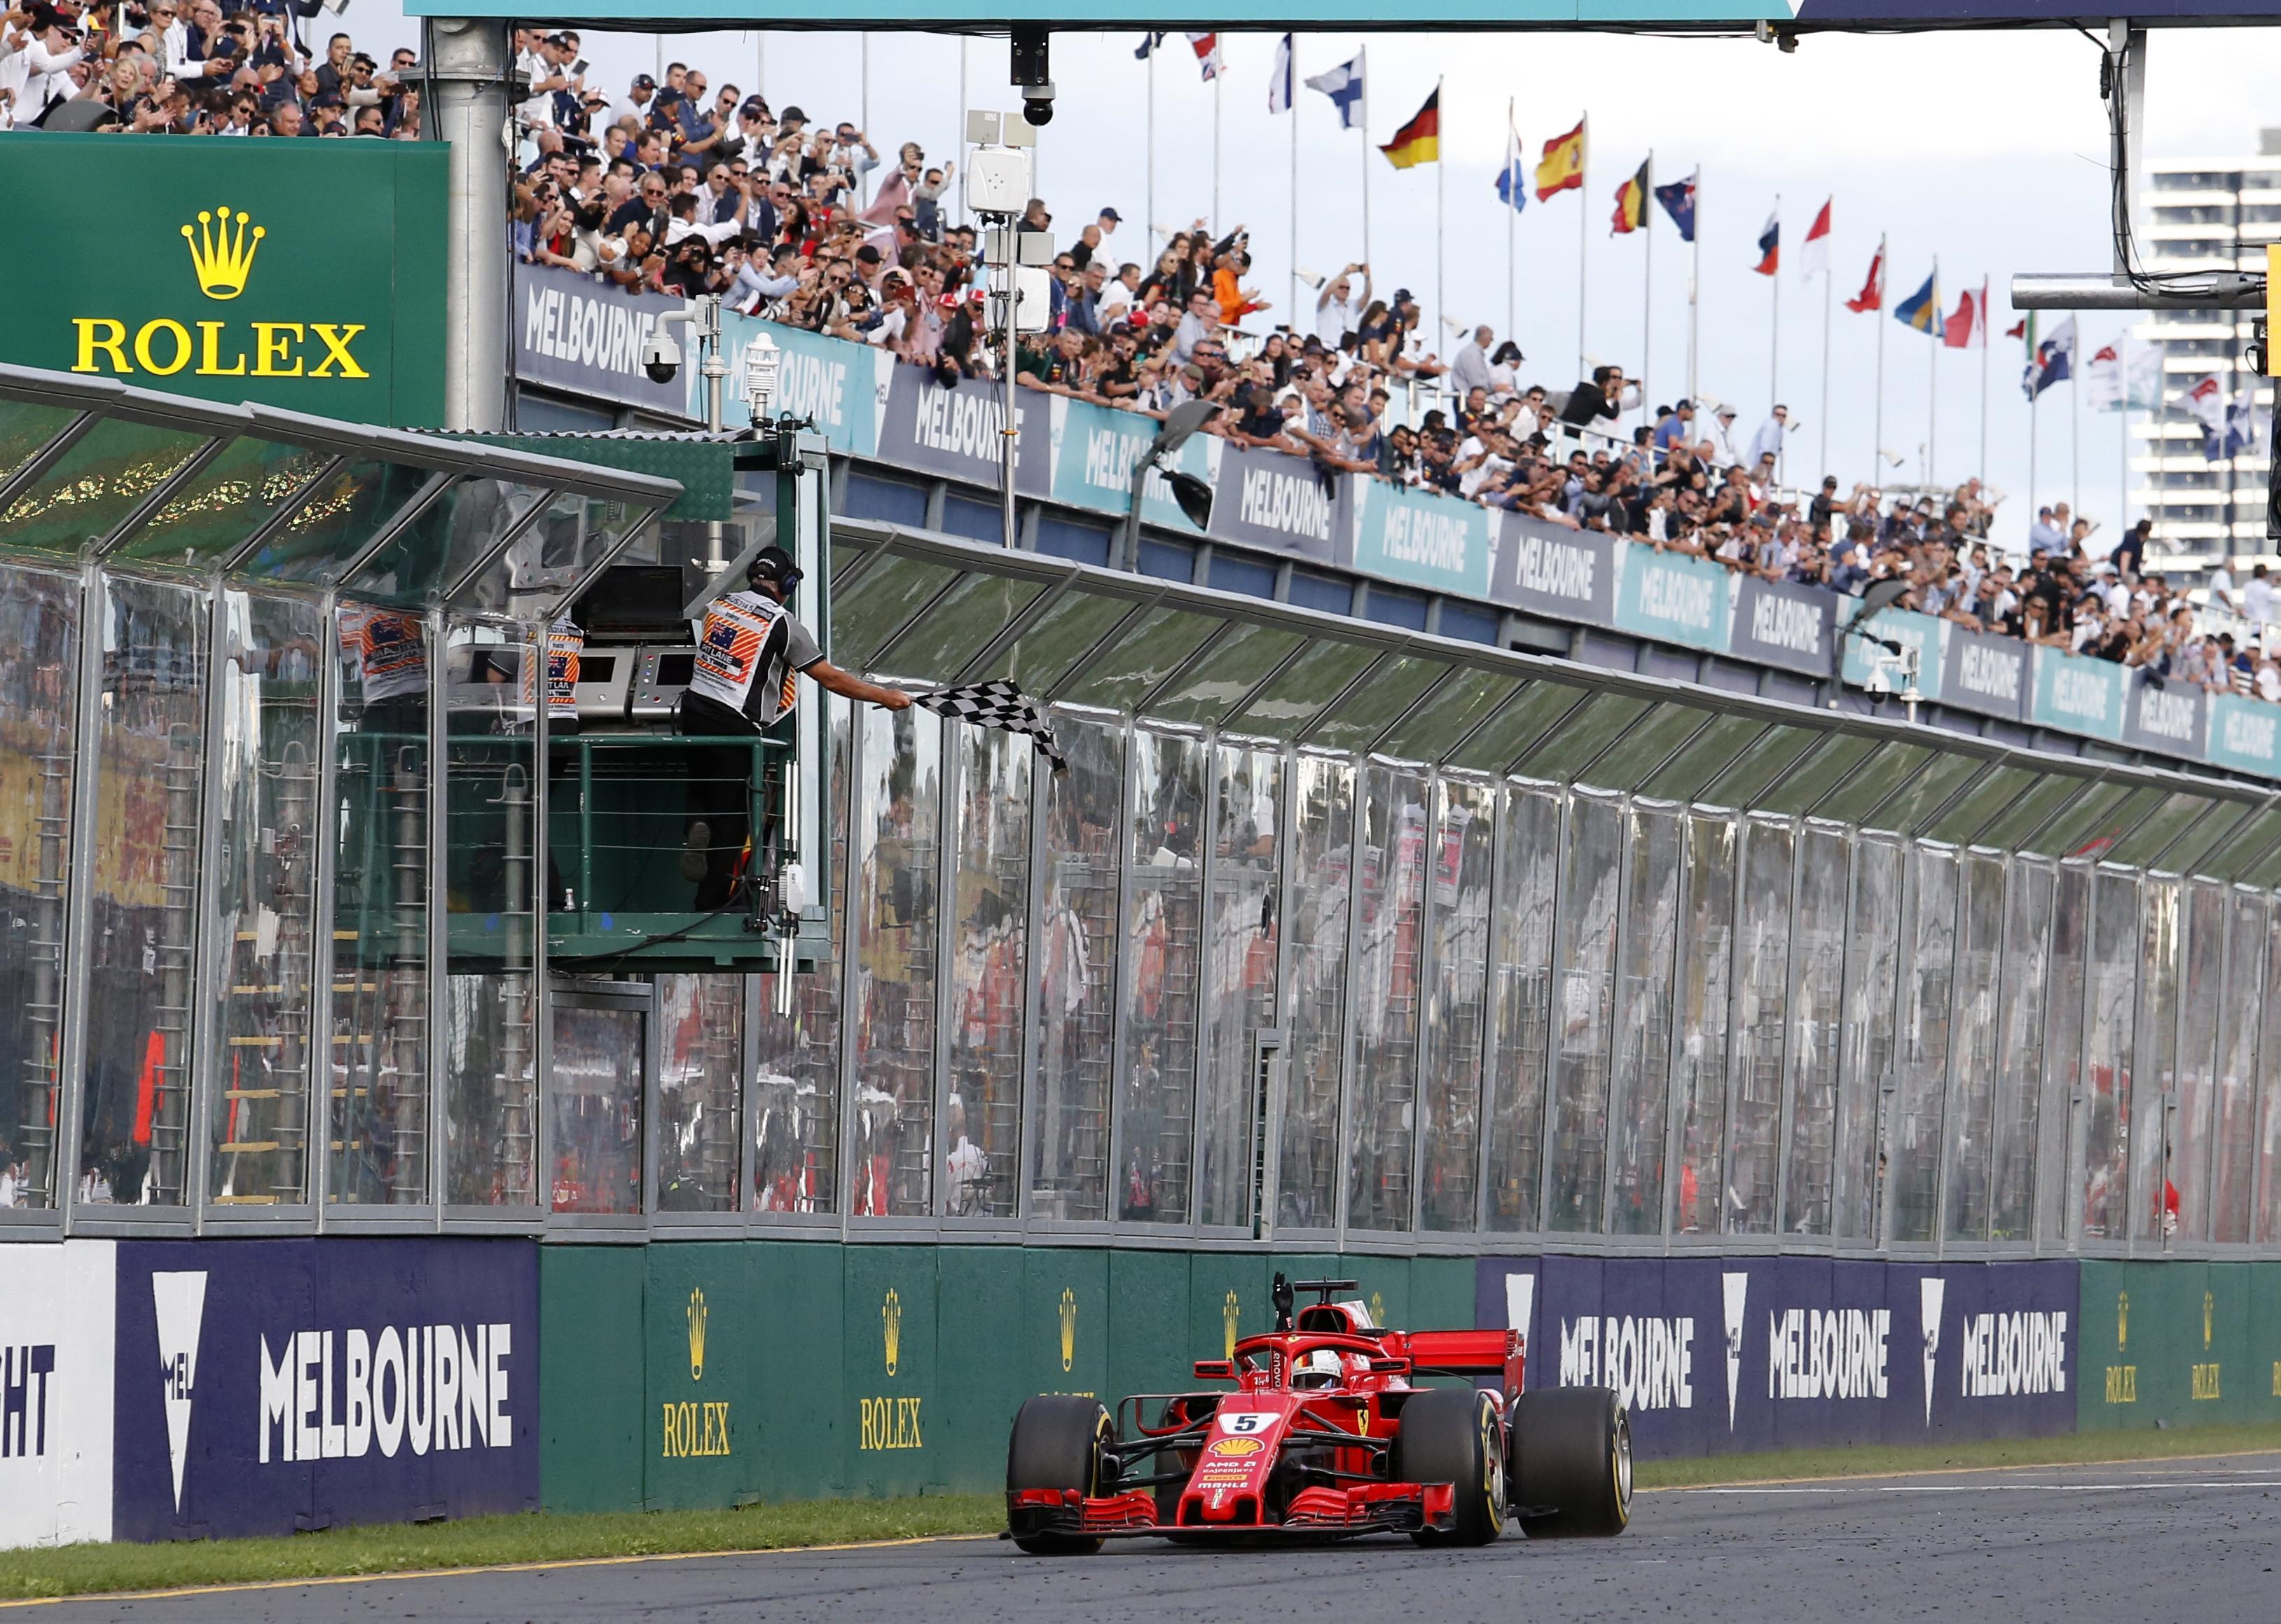 Sebastian Vettel crosses the finish line just ahead of Lewis Hamiltoin in Melbourne